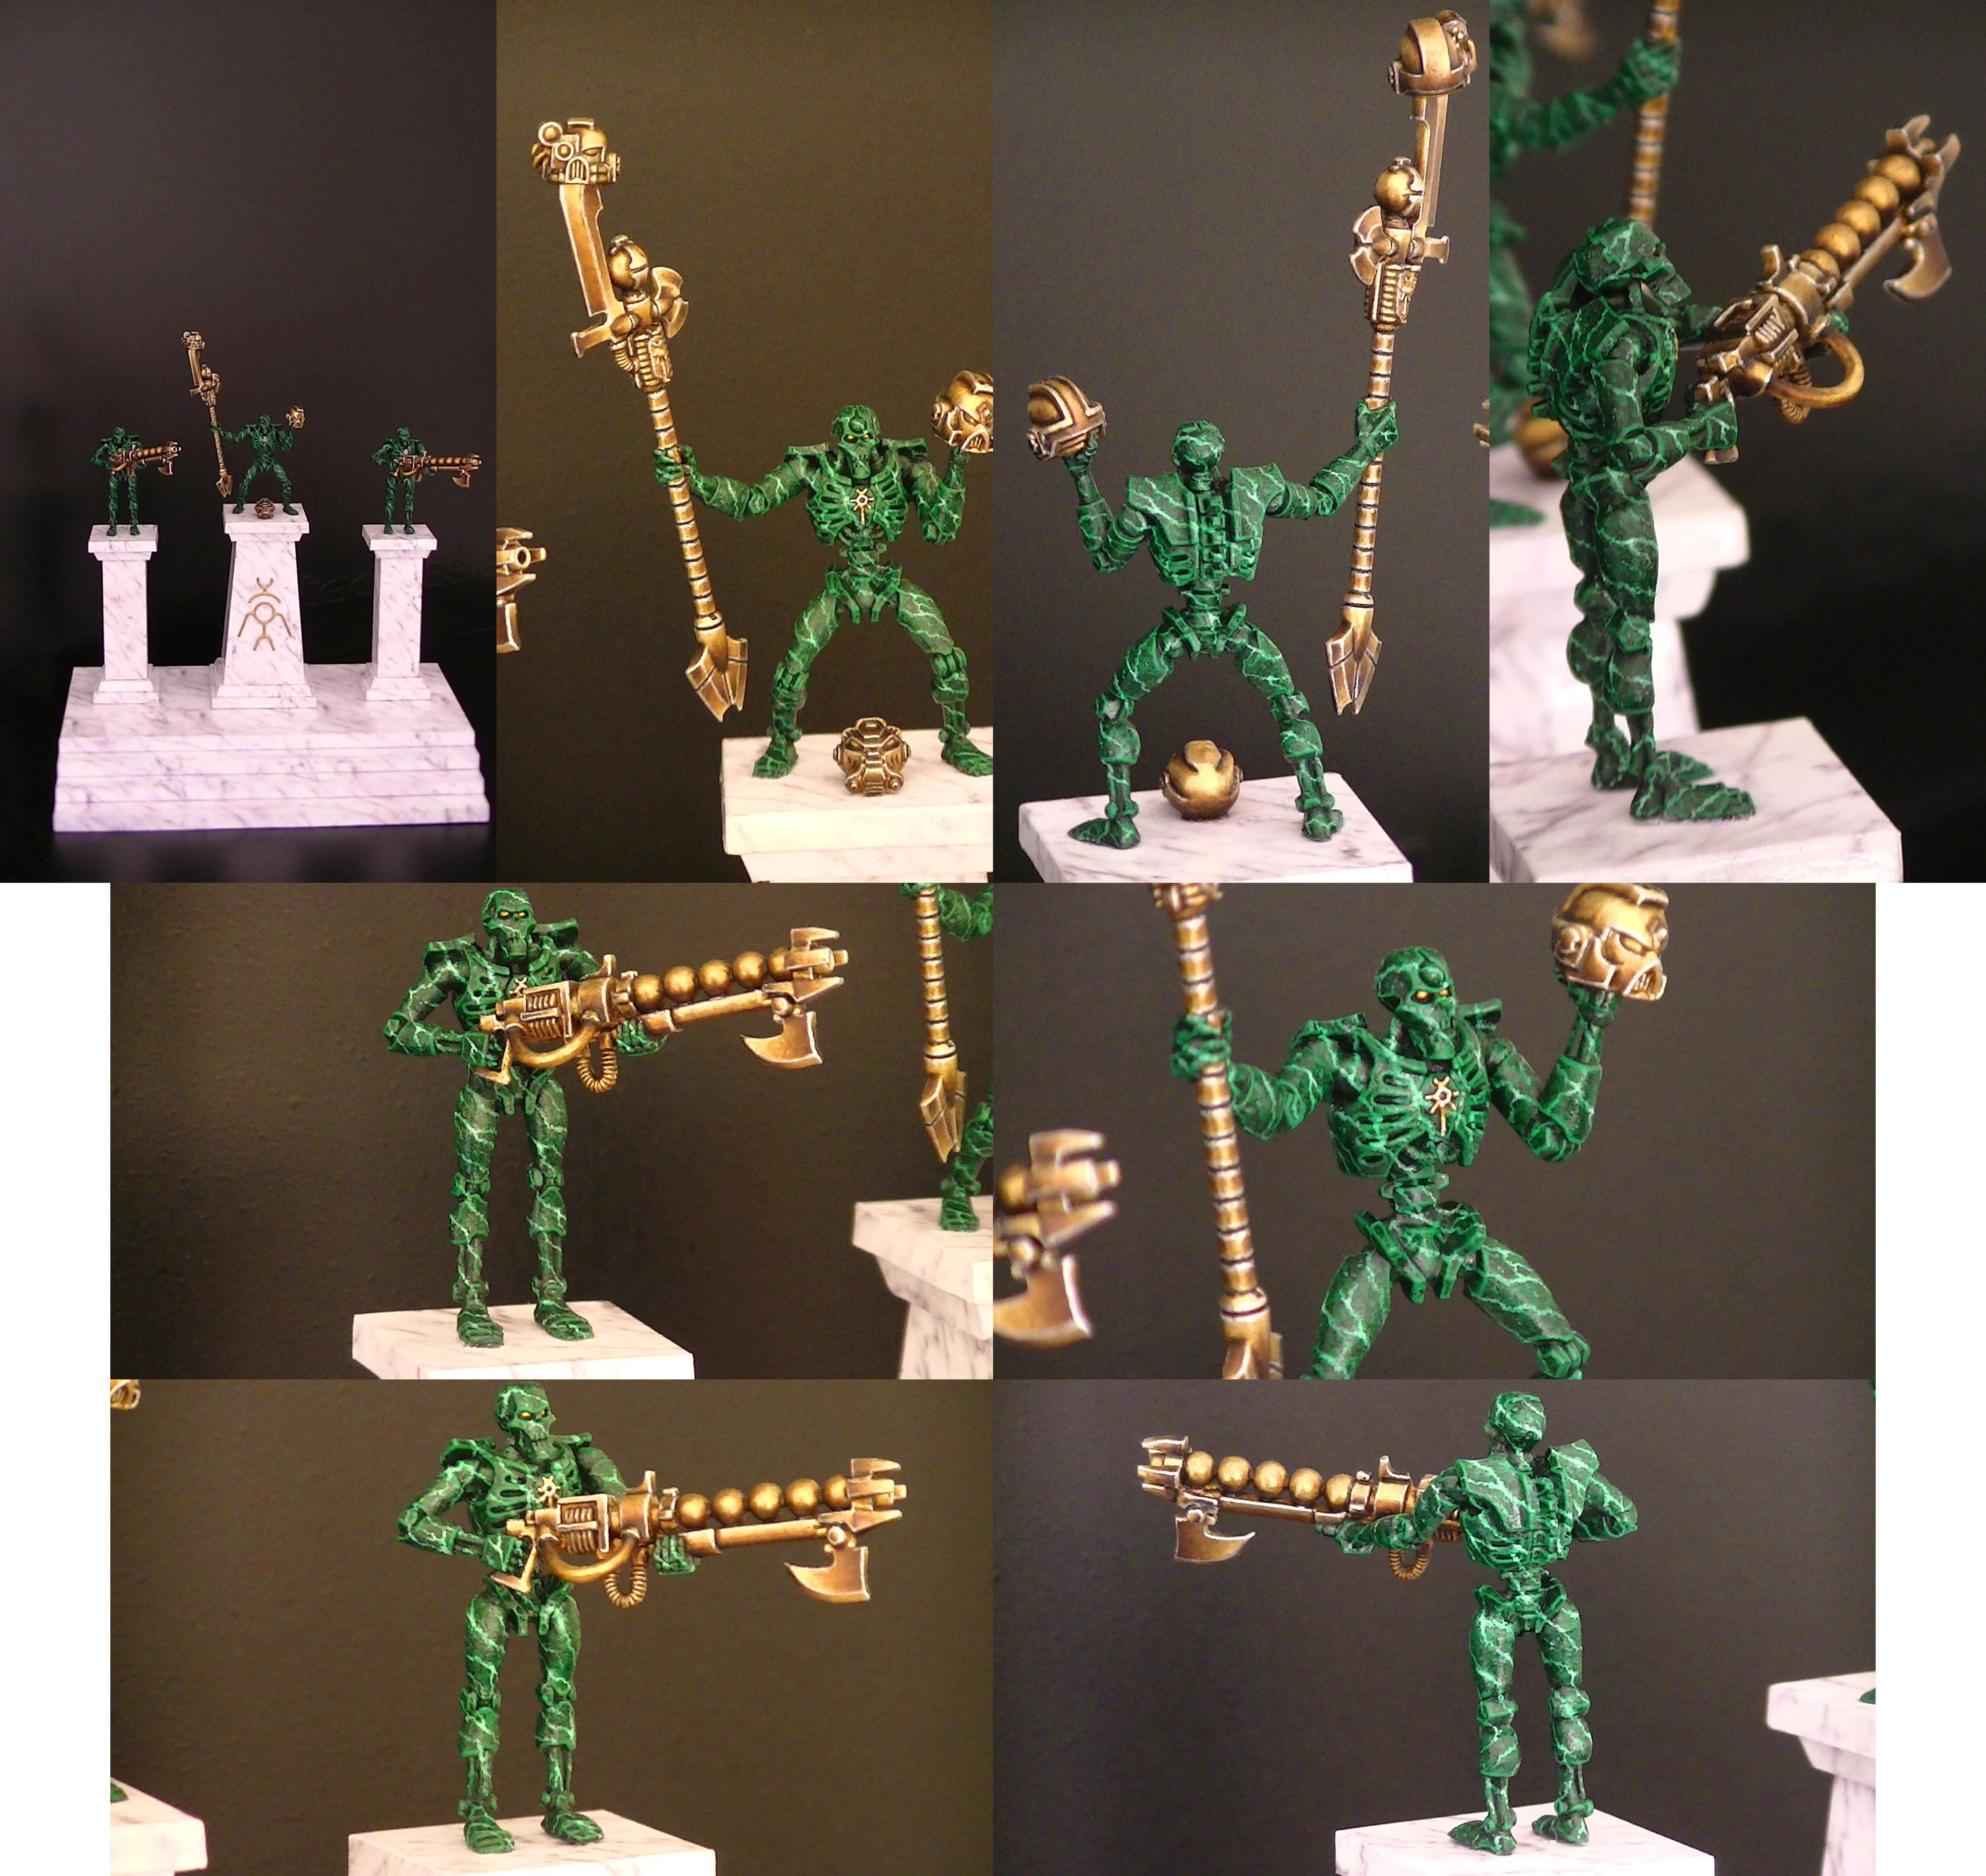 Necron Warriors (green marble)